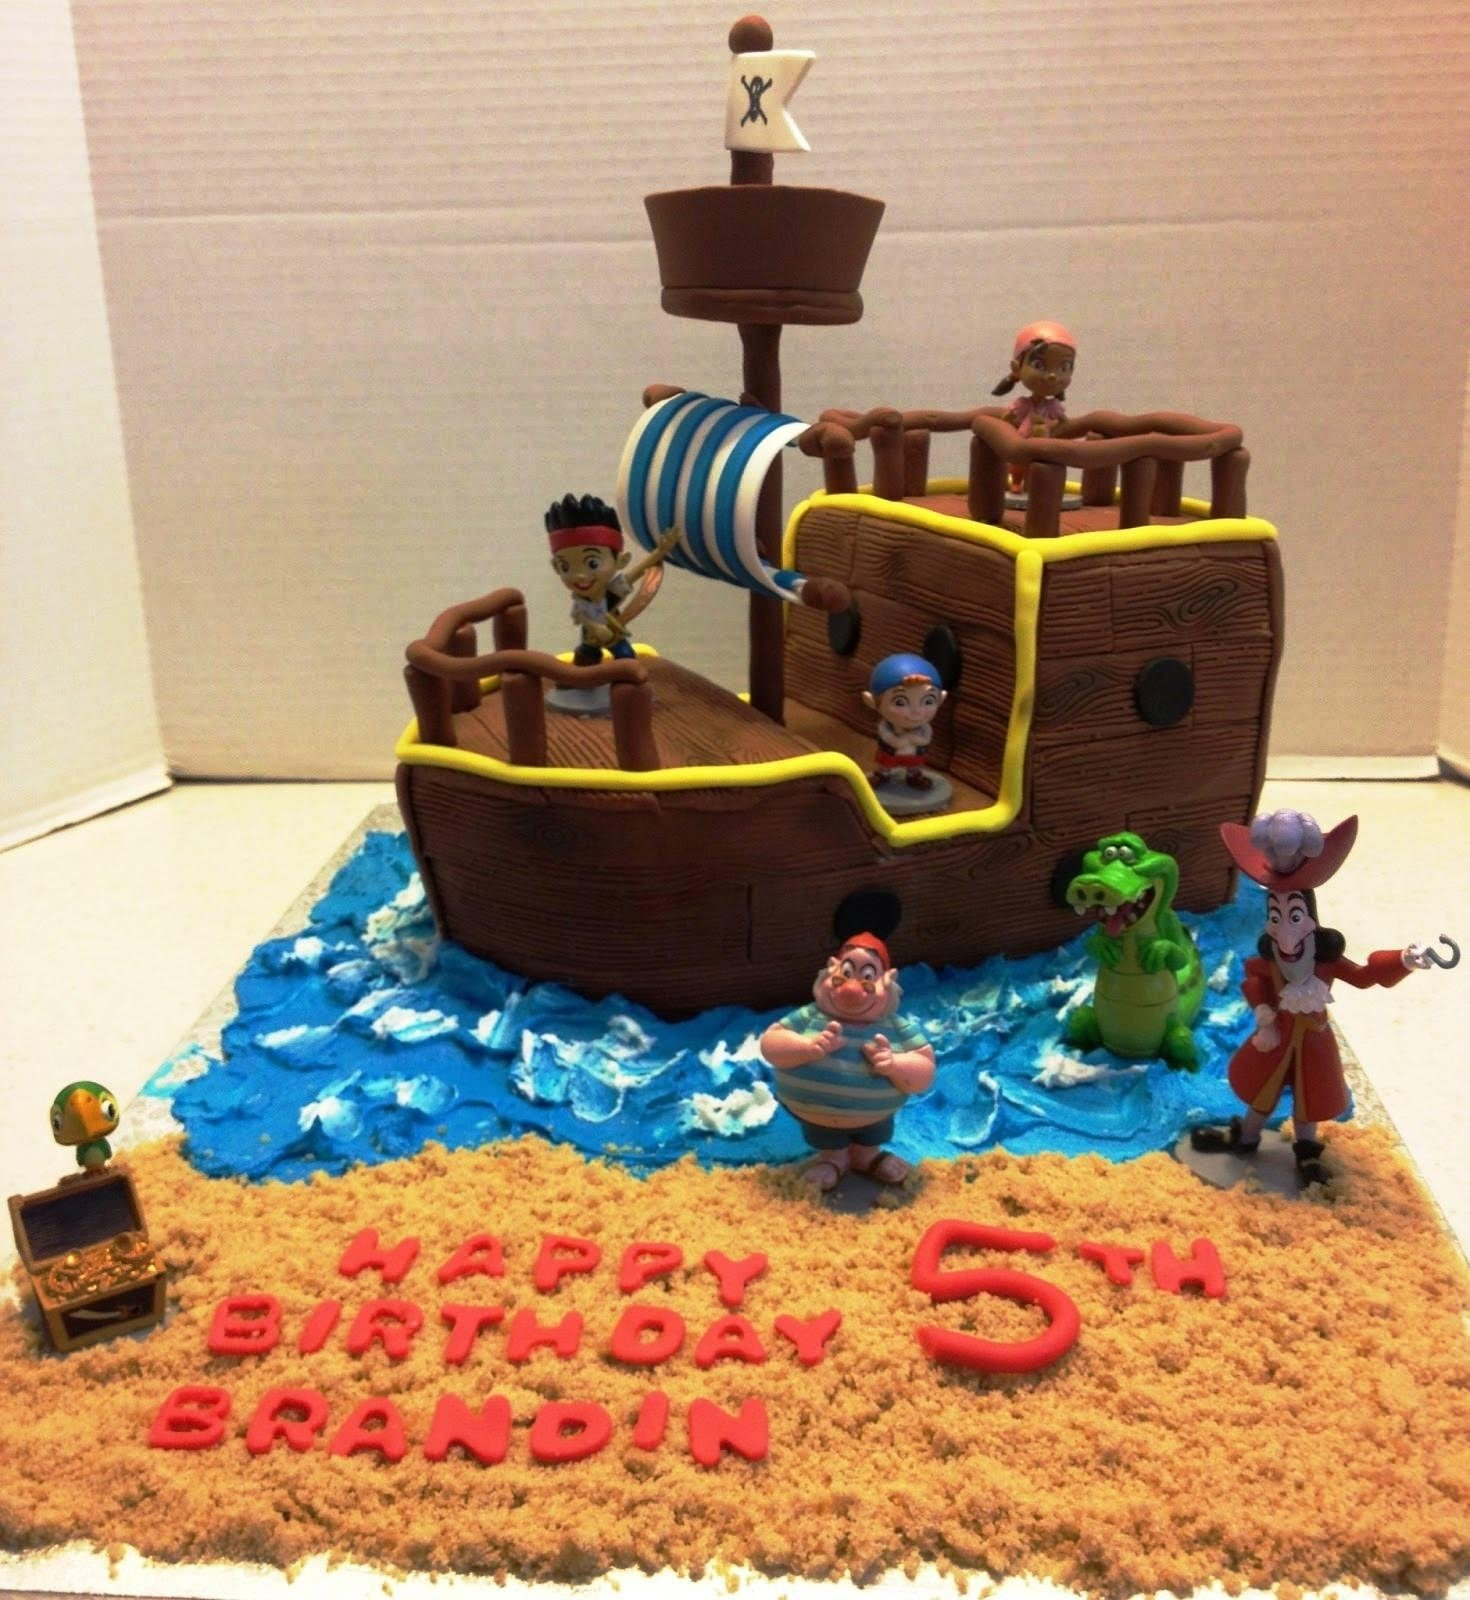 10 Lovable Jake And The Neverland Pirates Cake Ideas picture of jake and the neverland pirates birthday cake protoblogr 2021